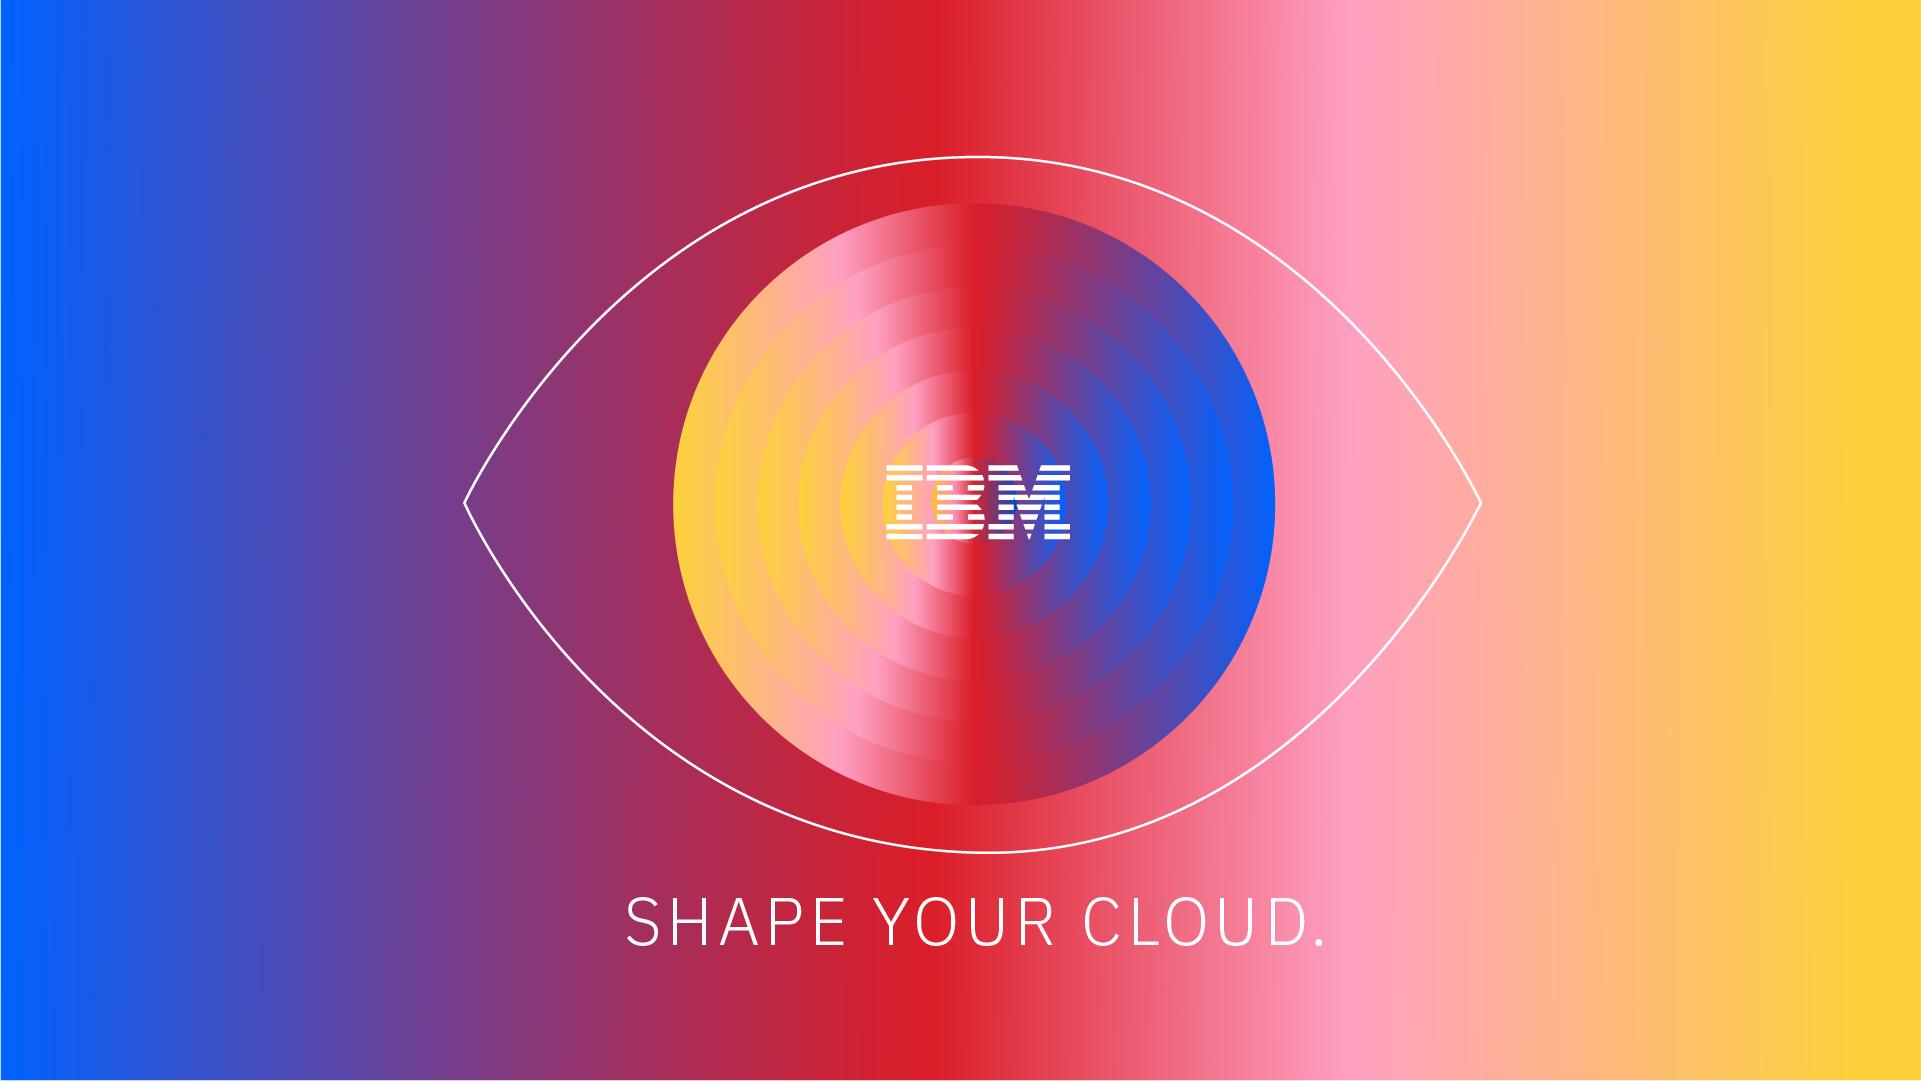 IBM_SHAPE-YOUR-CLOUD_DC_EDITS_BH_proceso_IBM-process-9.jpg